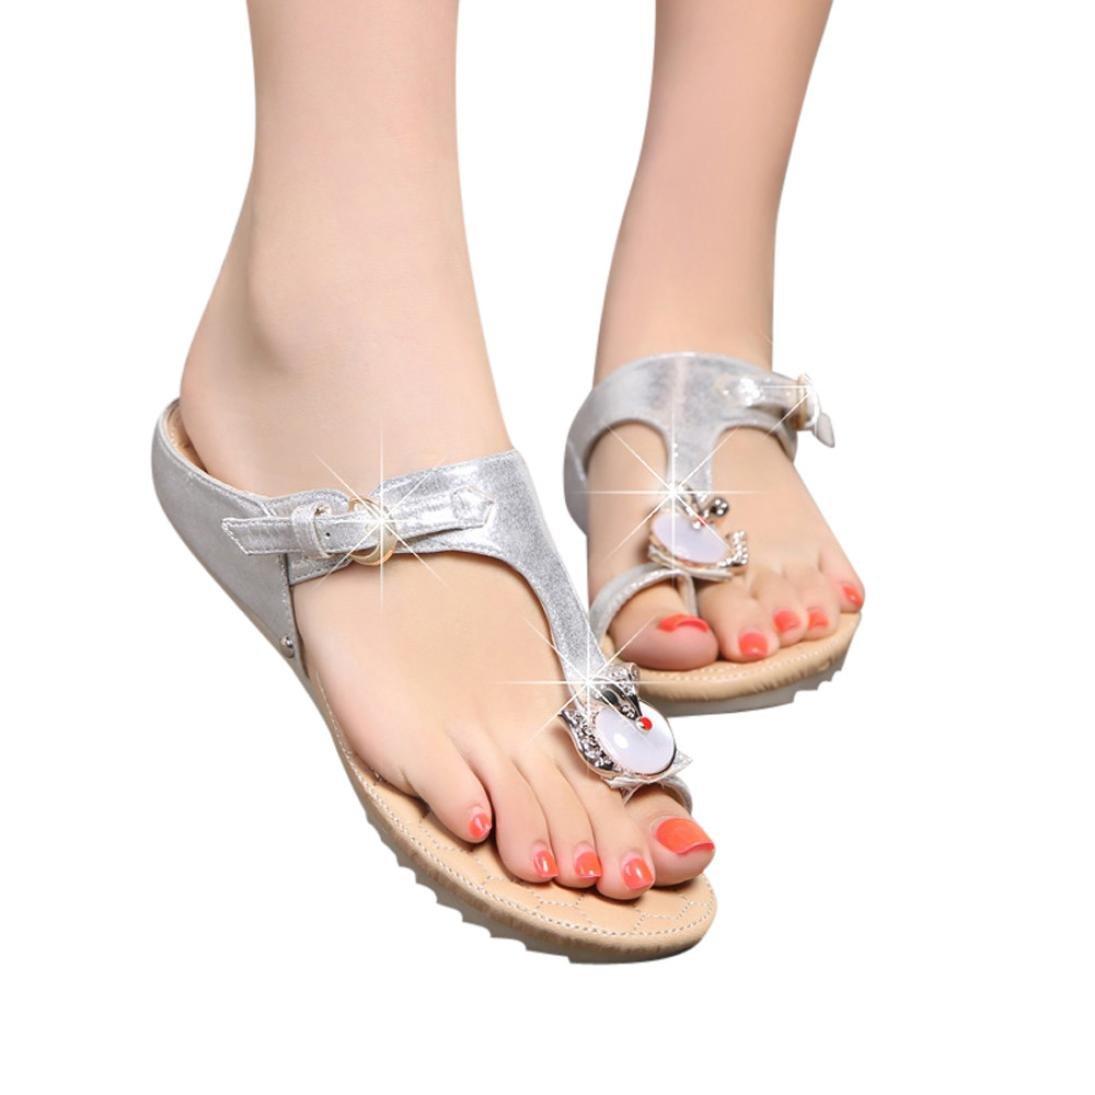 Ouneed- Damen Sandalen, Damen Sommer Mode Frauen Strass Flache Ferse Anti Skidding Strand Schuhe Sandalen Slipper36|Silber